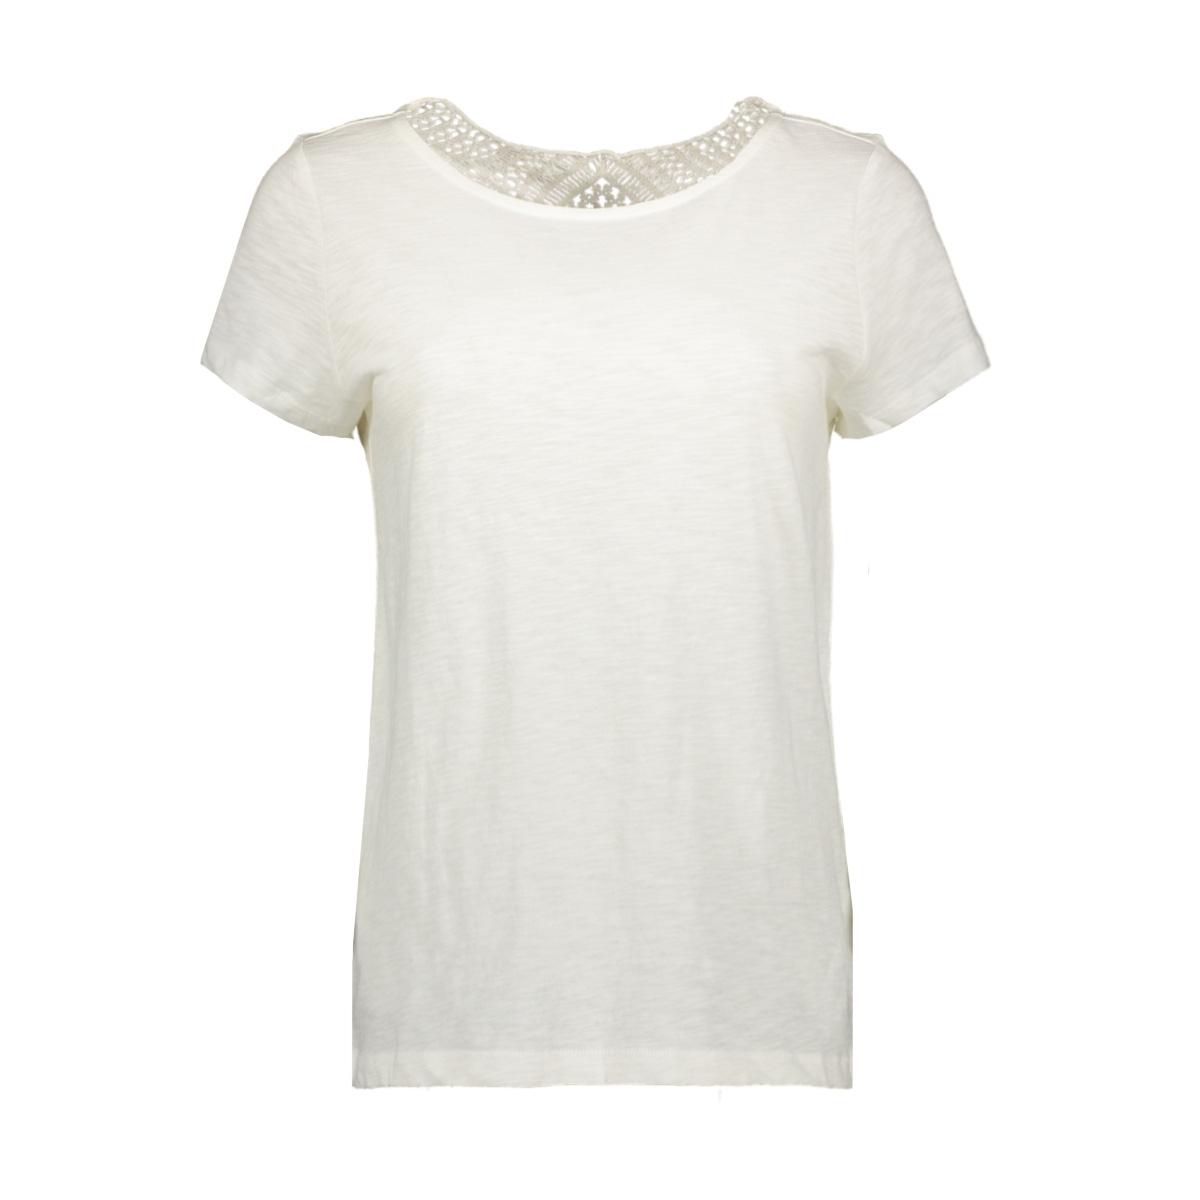 t shirt met kanten details 14006325104 s.oliver t-shirt 0210